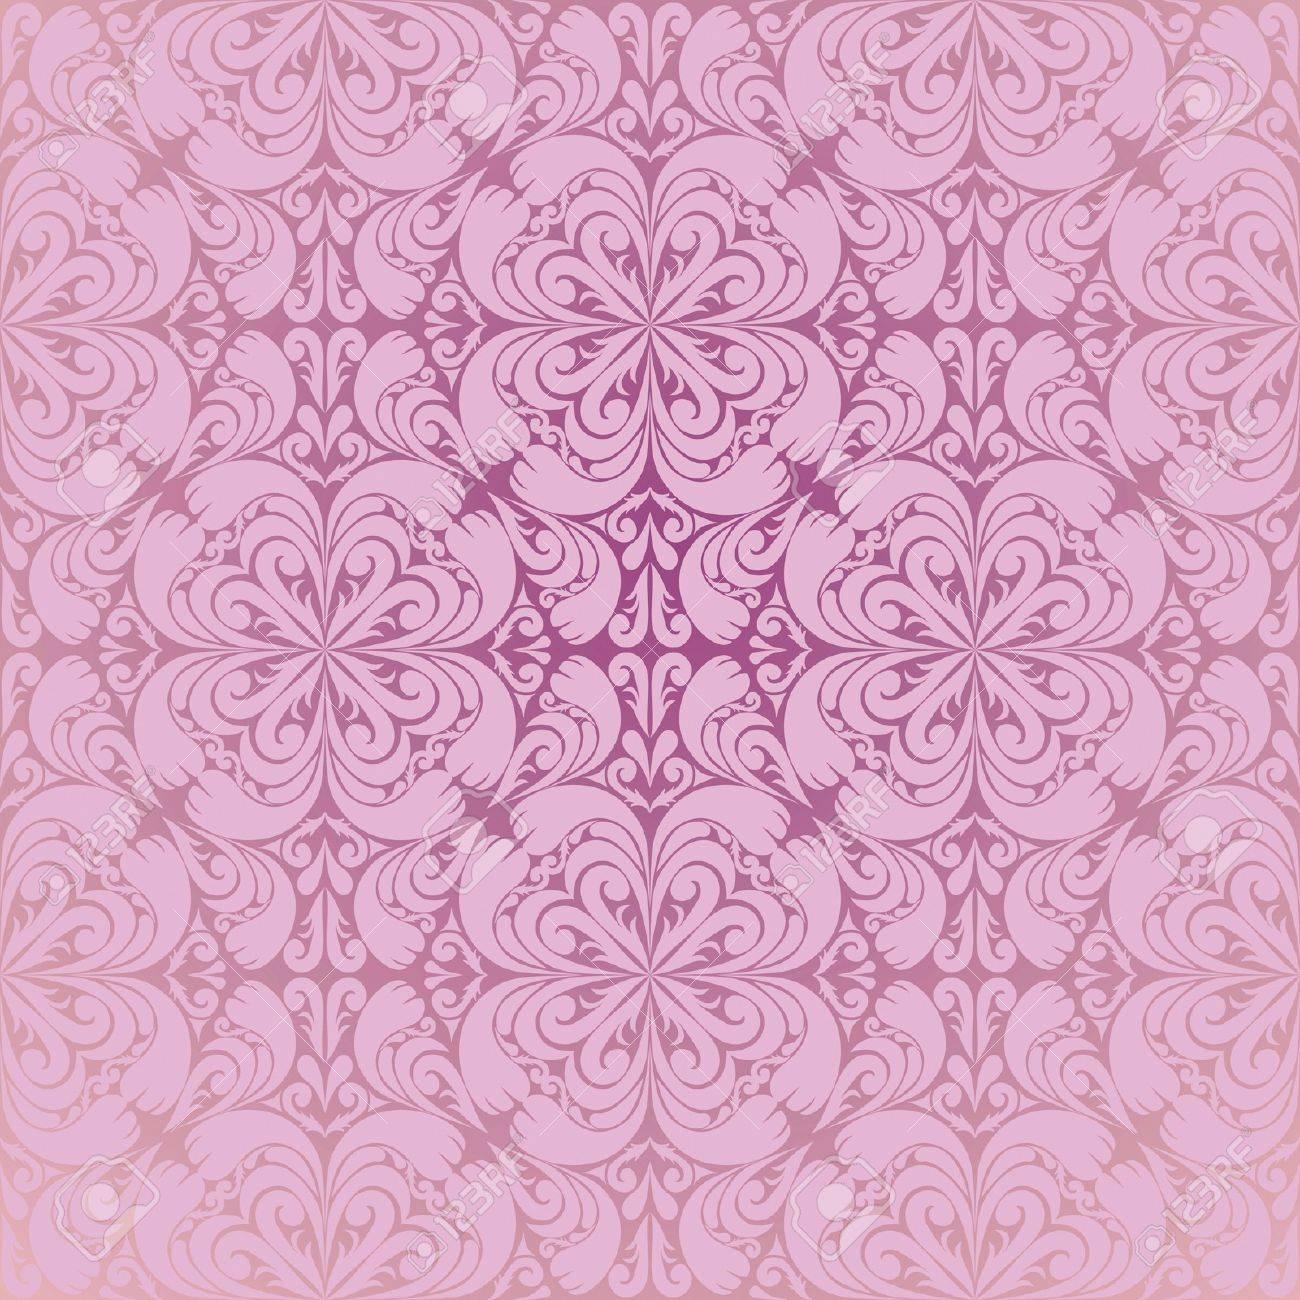 Seamless pink wallpaper - 13026251